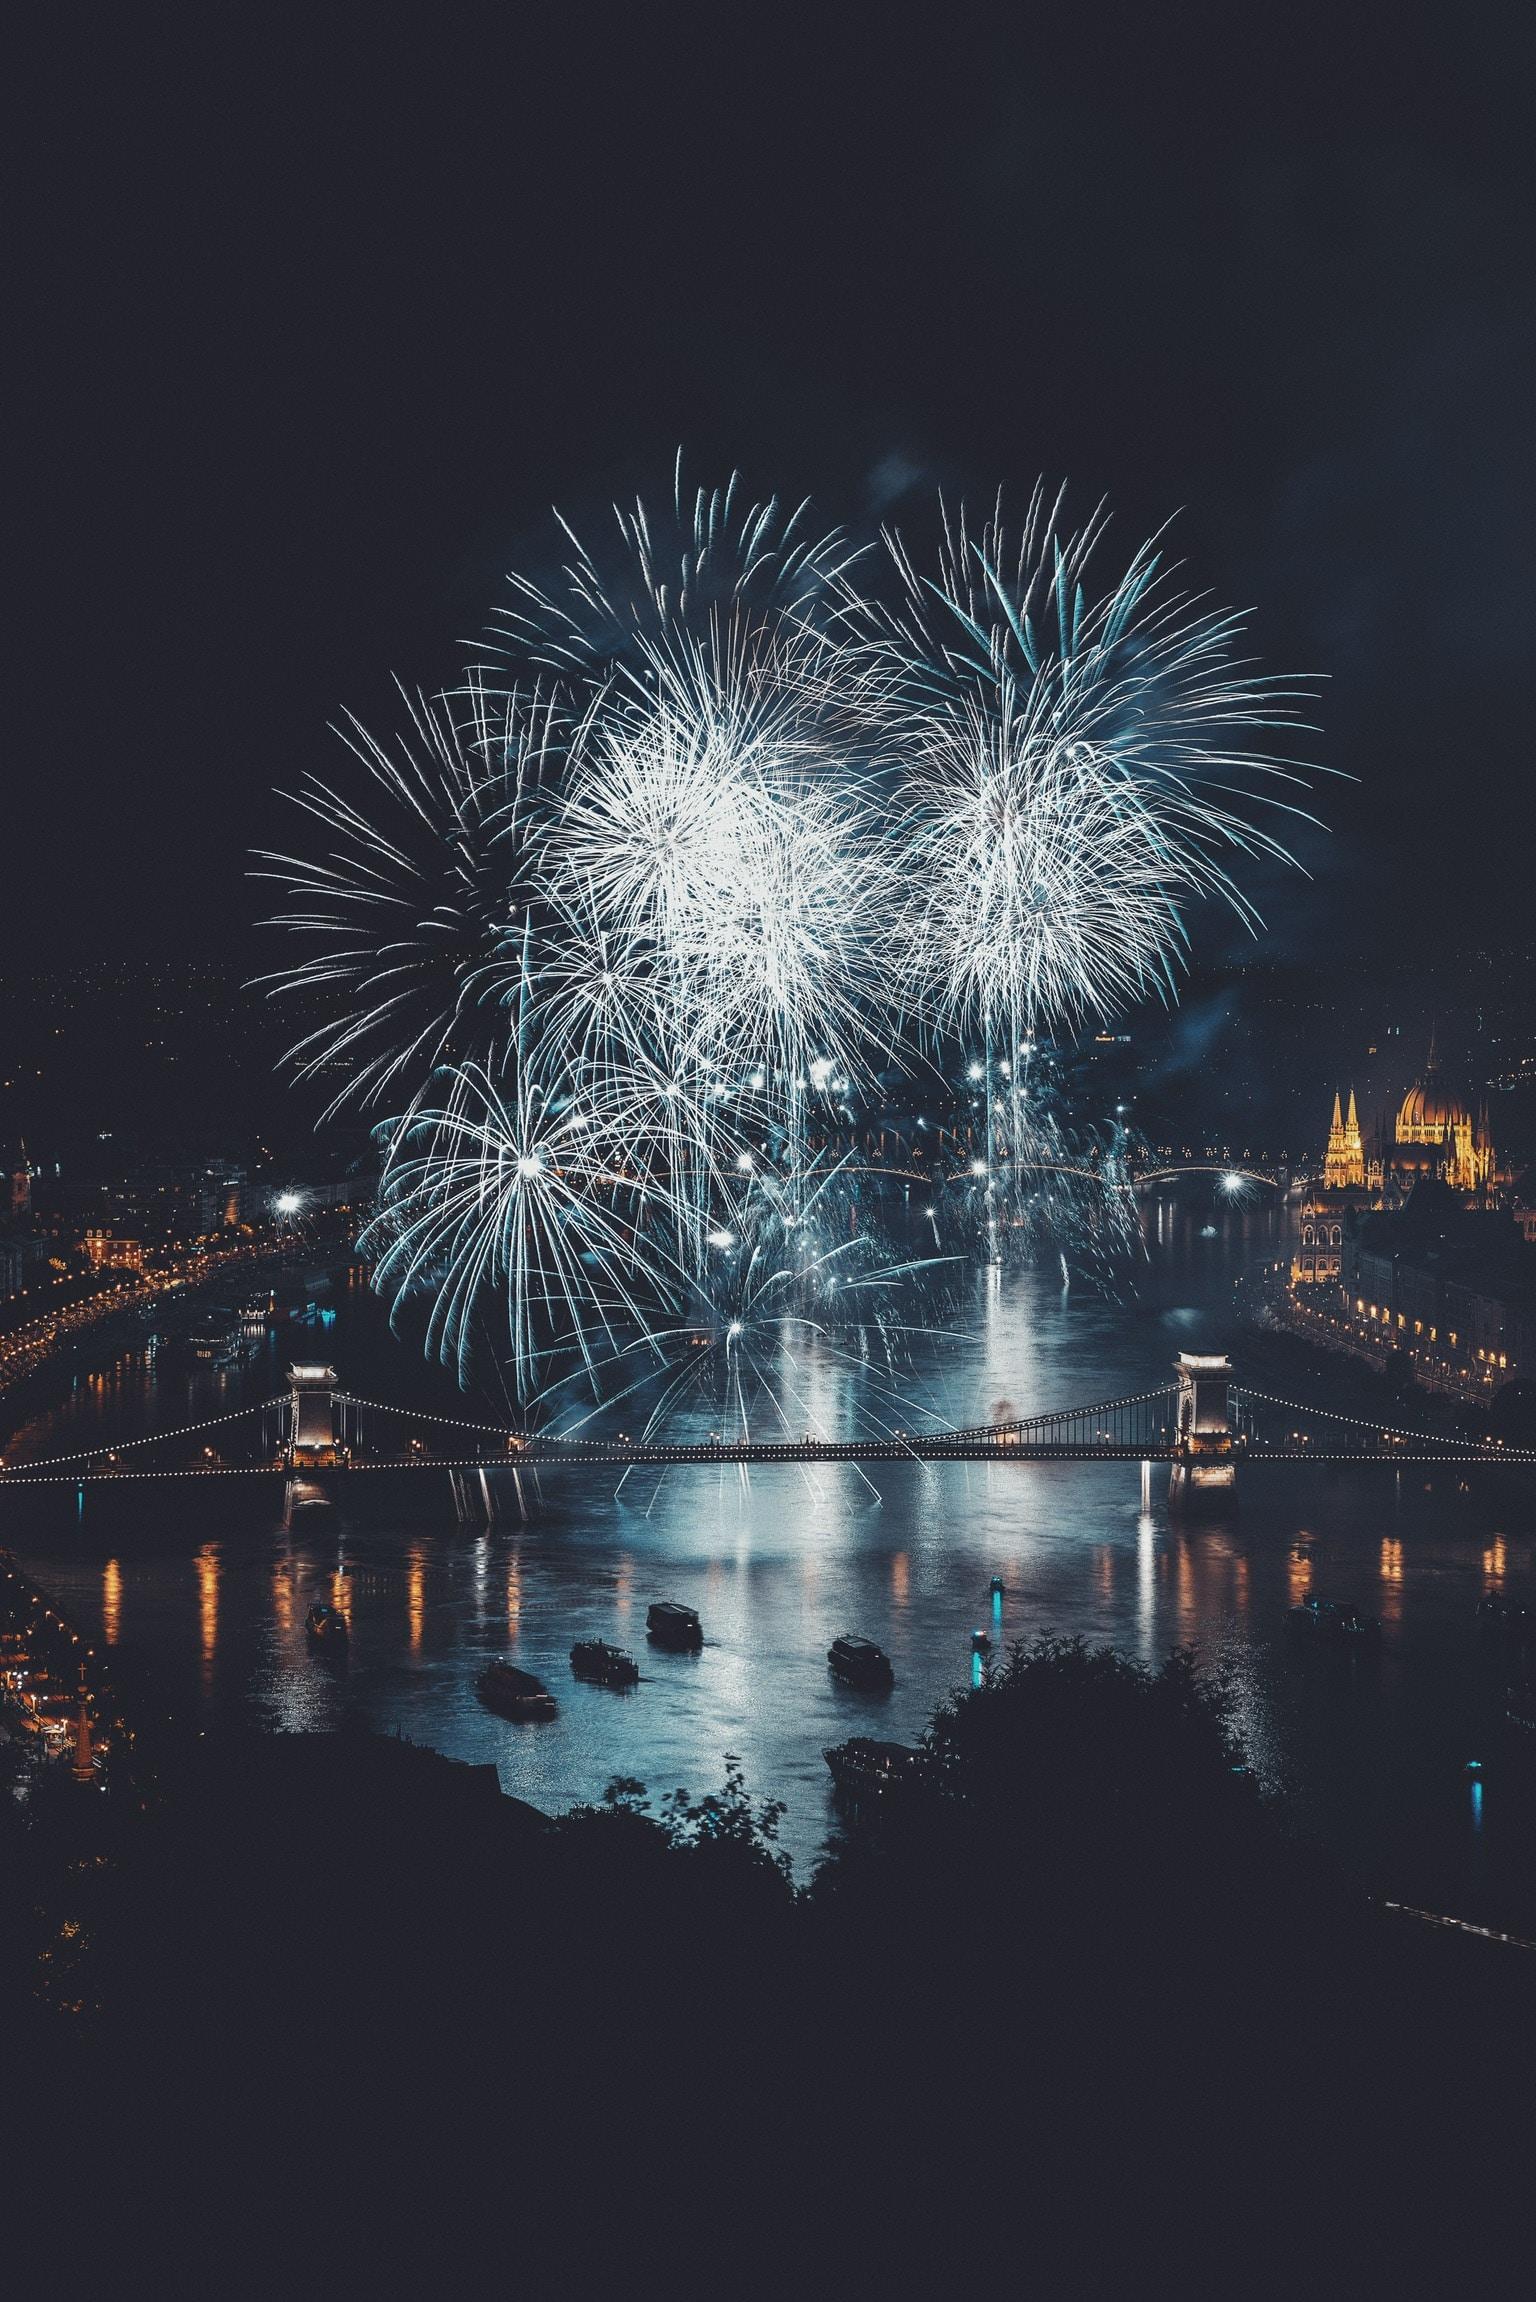 fireworks over bridge during nighttime